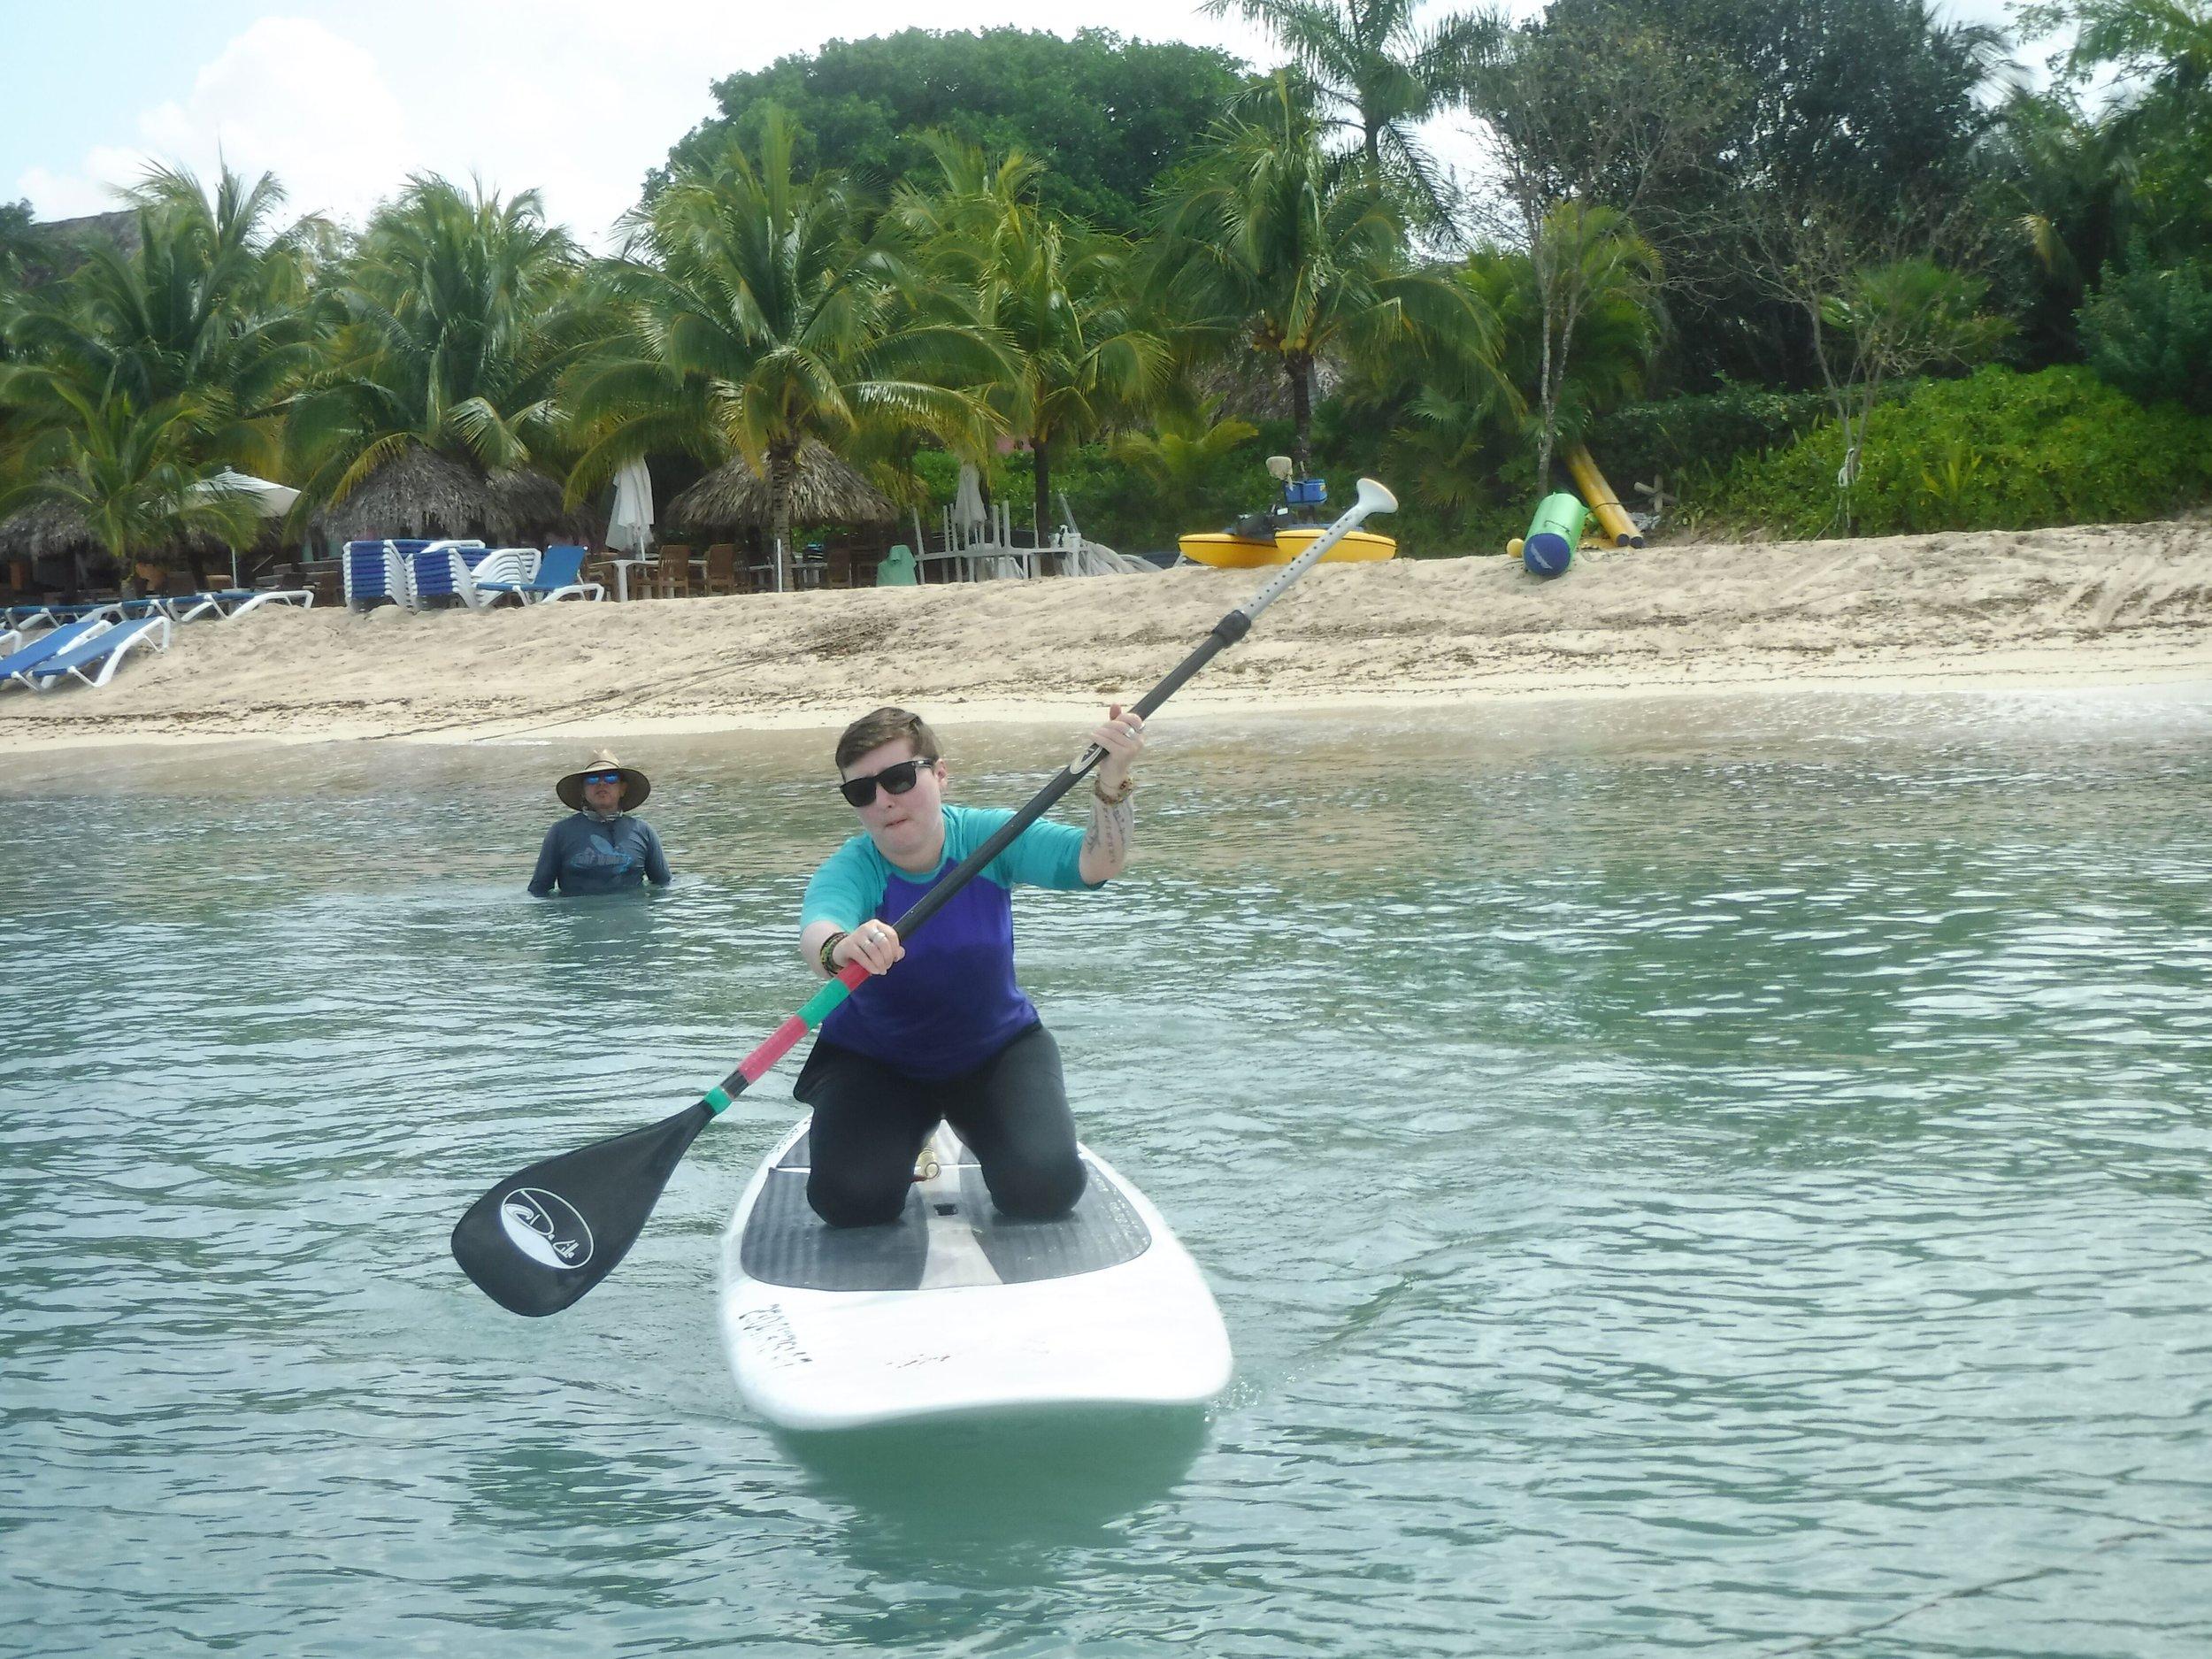 Ha Haak Paddleboarding